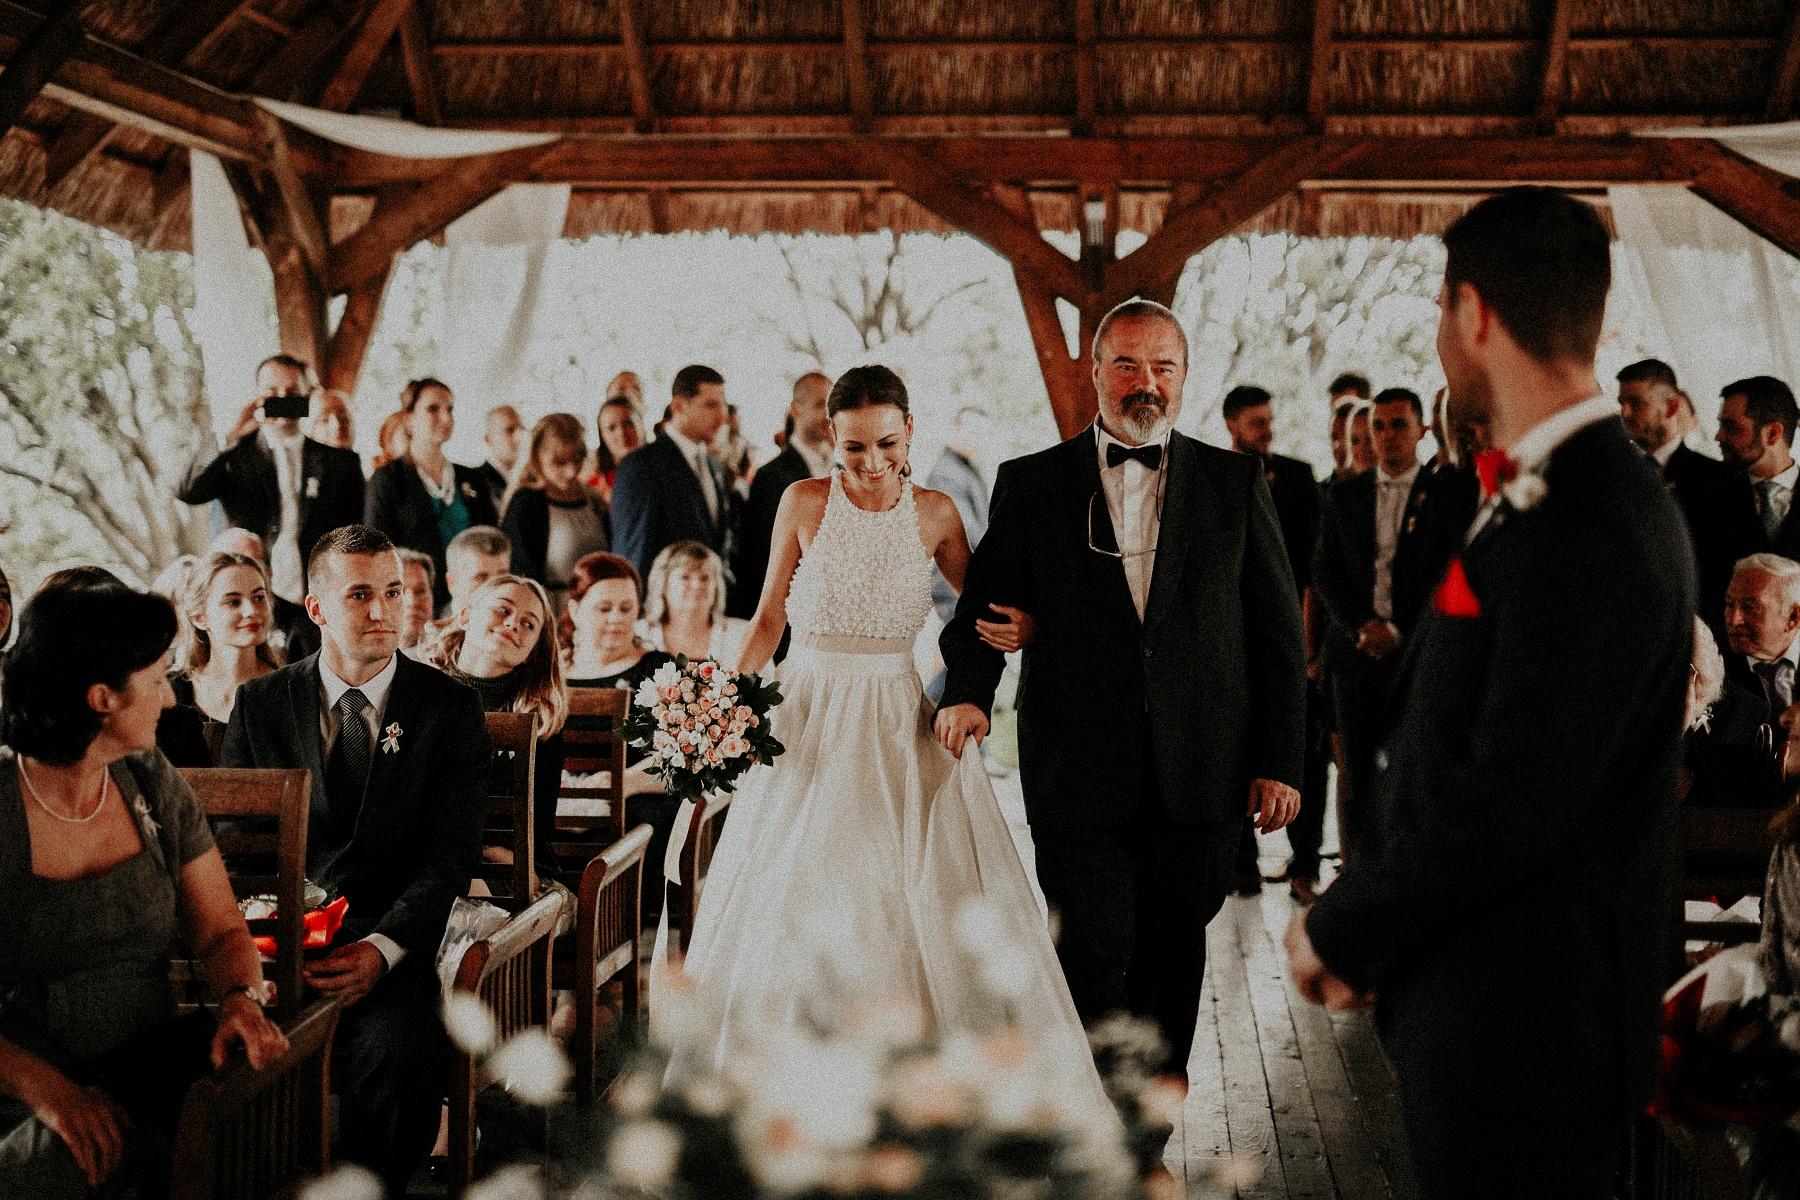 fotenie v tatrach, fotograf lubos krahulec, slovakia wedding, tatry, fotky, fotograf presov, fotograf kosice, poprad, vychod, slovensky svadobny fotograf, hladam fotografa